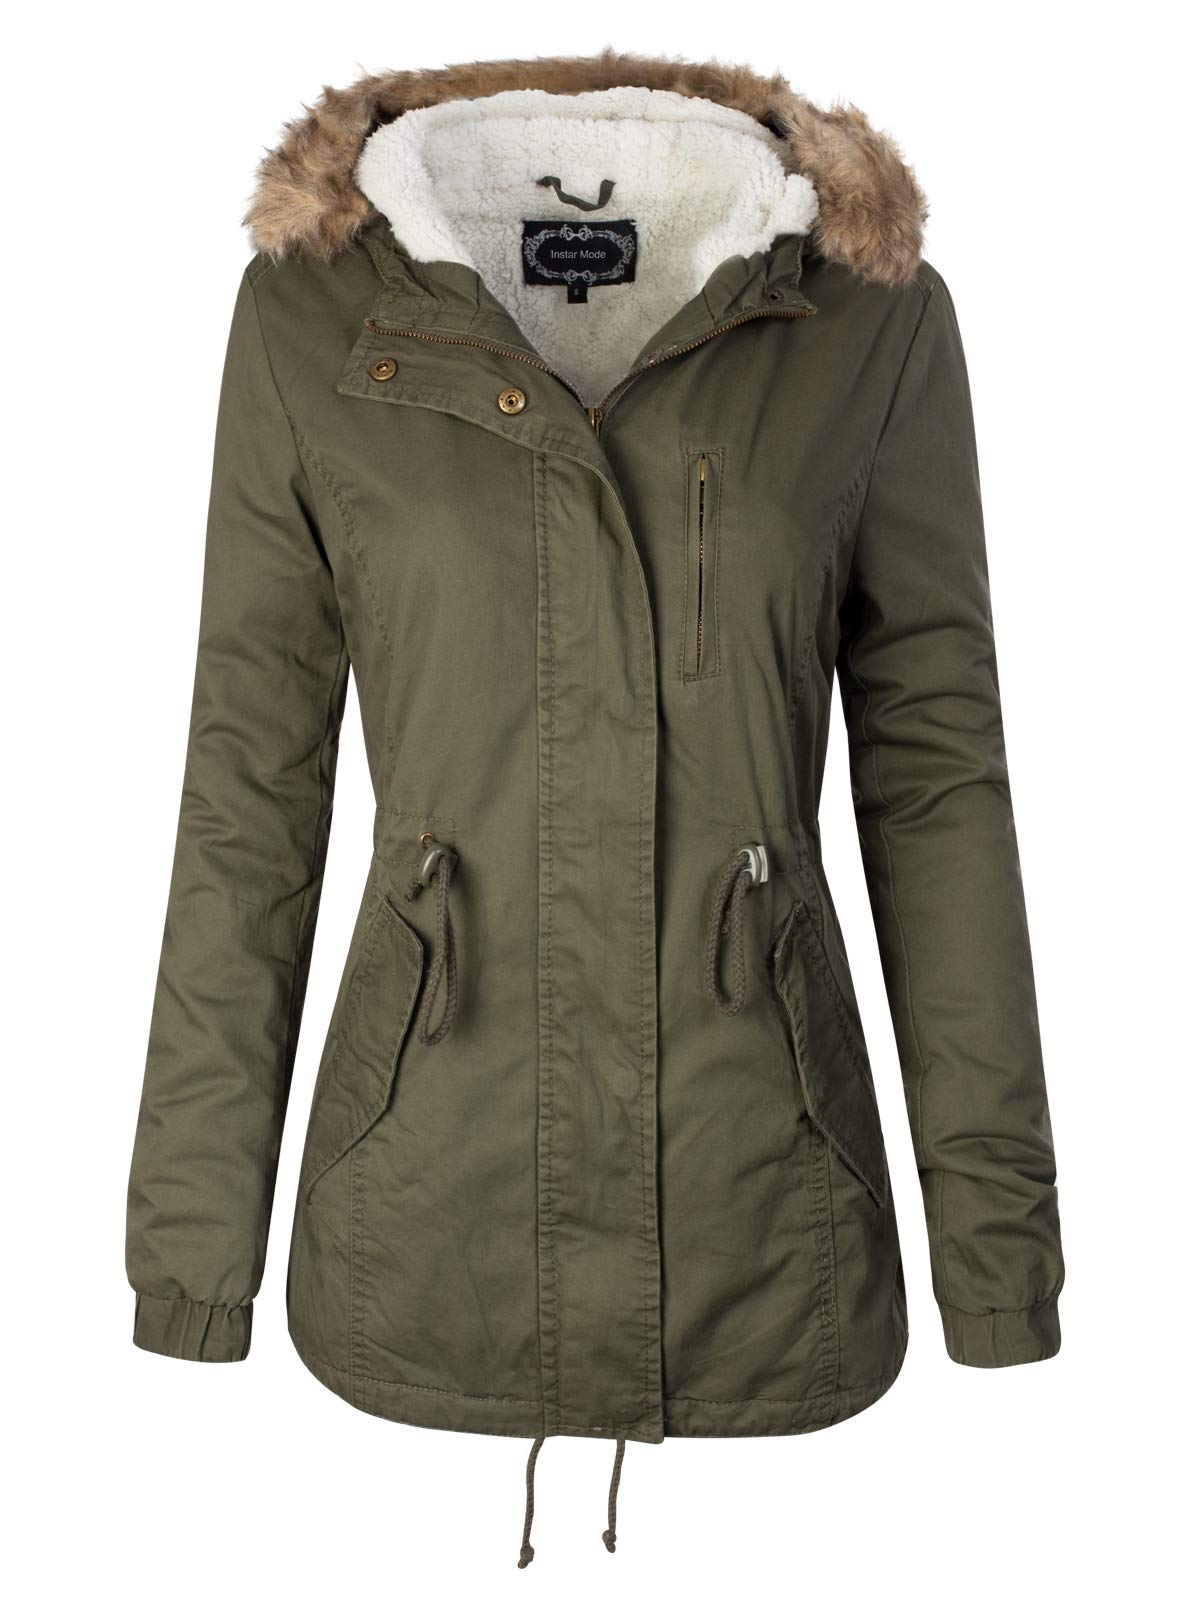 Instar Mode Women's Faux Fur Hoodie Sherpa Lined Military Safari Utility Fashion Jacket Olive L